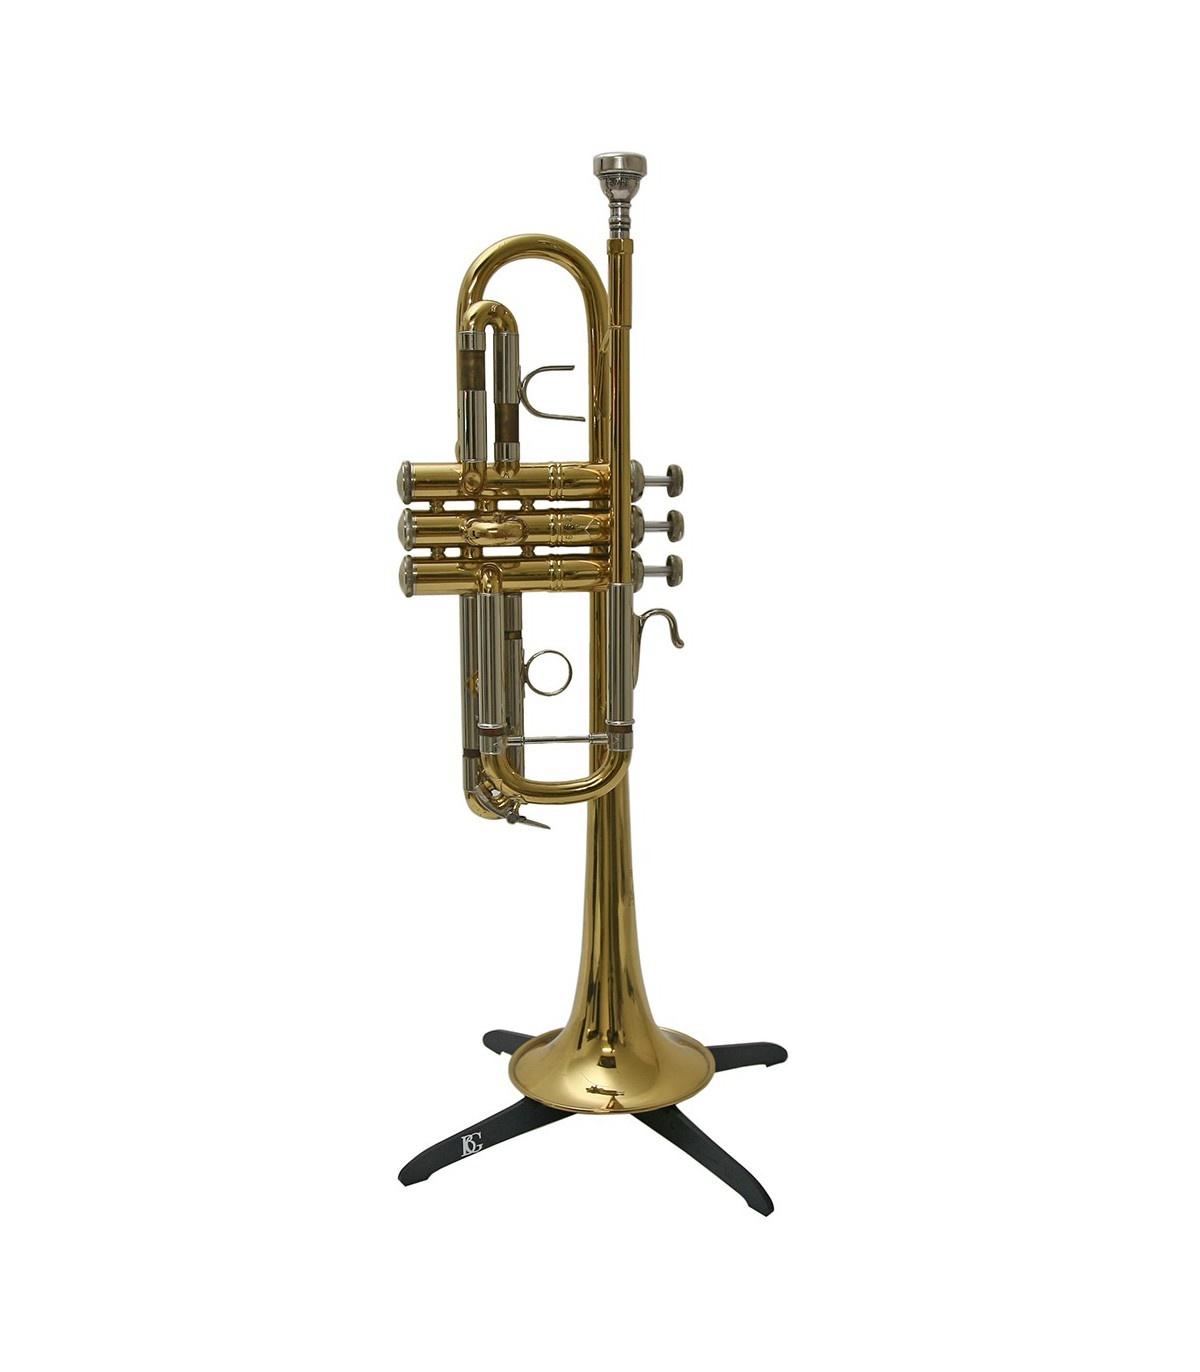 BG BG A42 Stand for Trumpet, Cornet, Flugelhorn, Soprano Sax